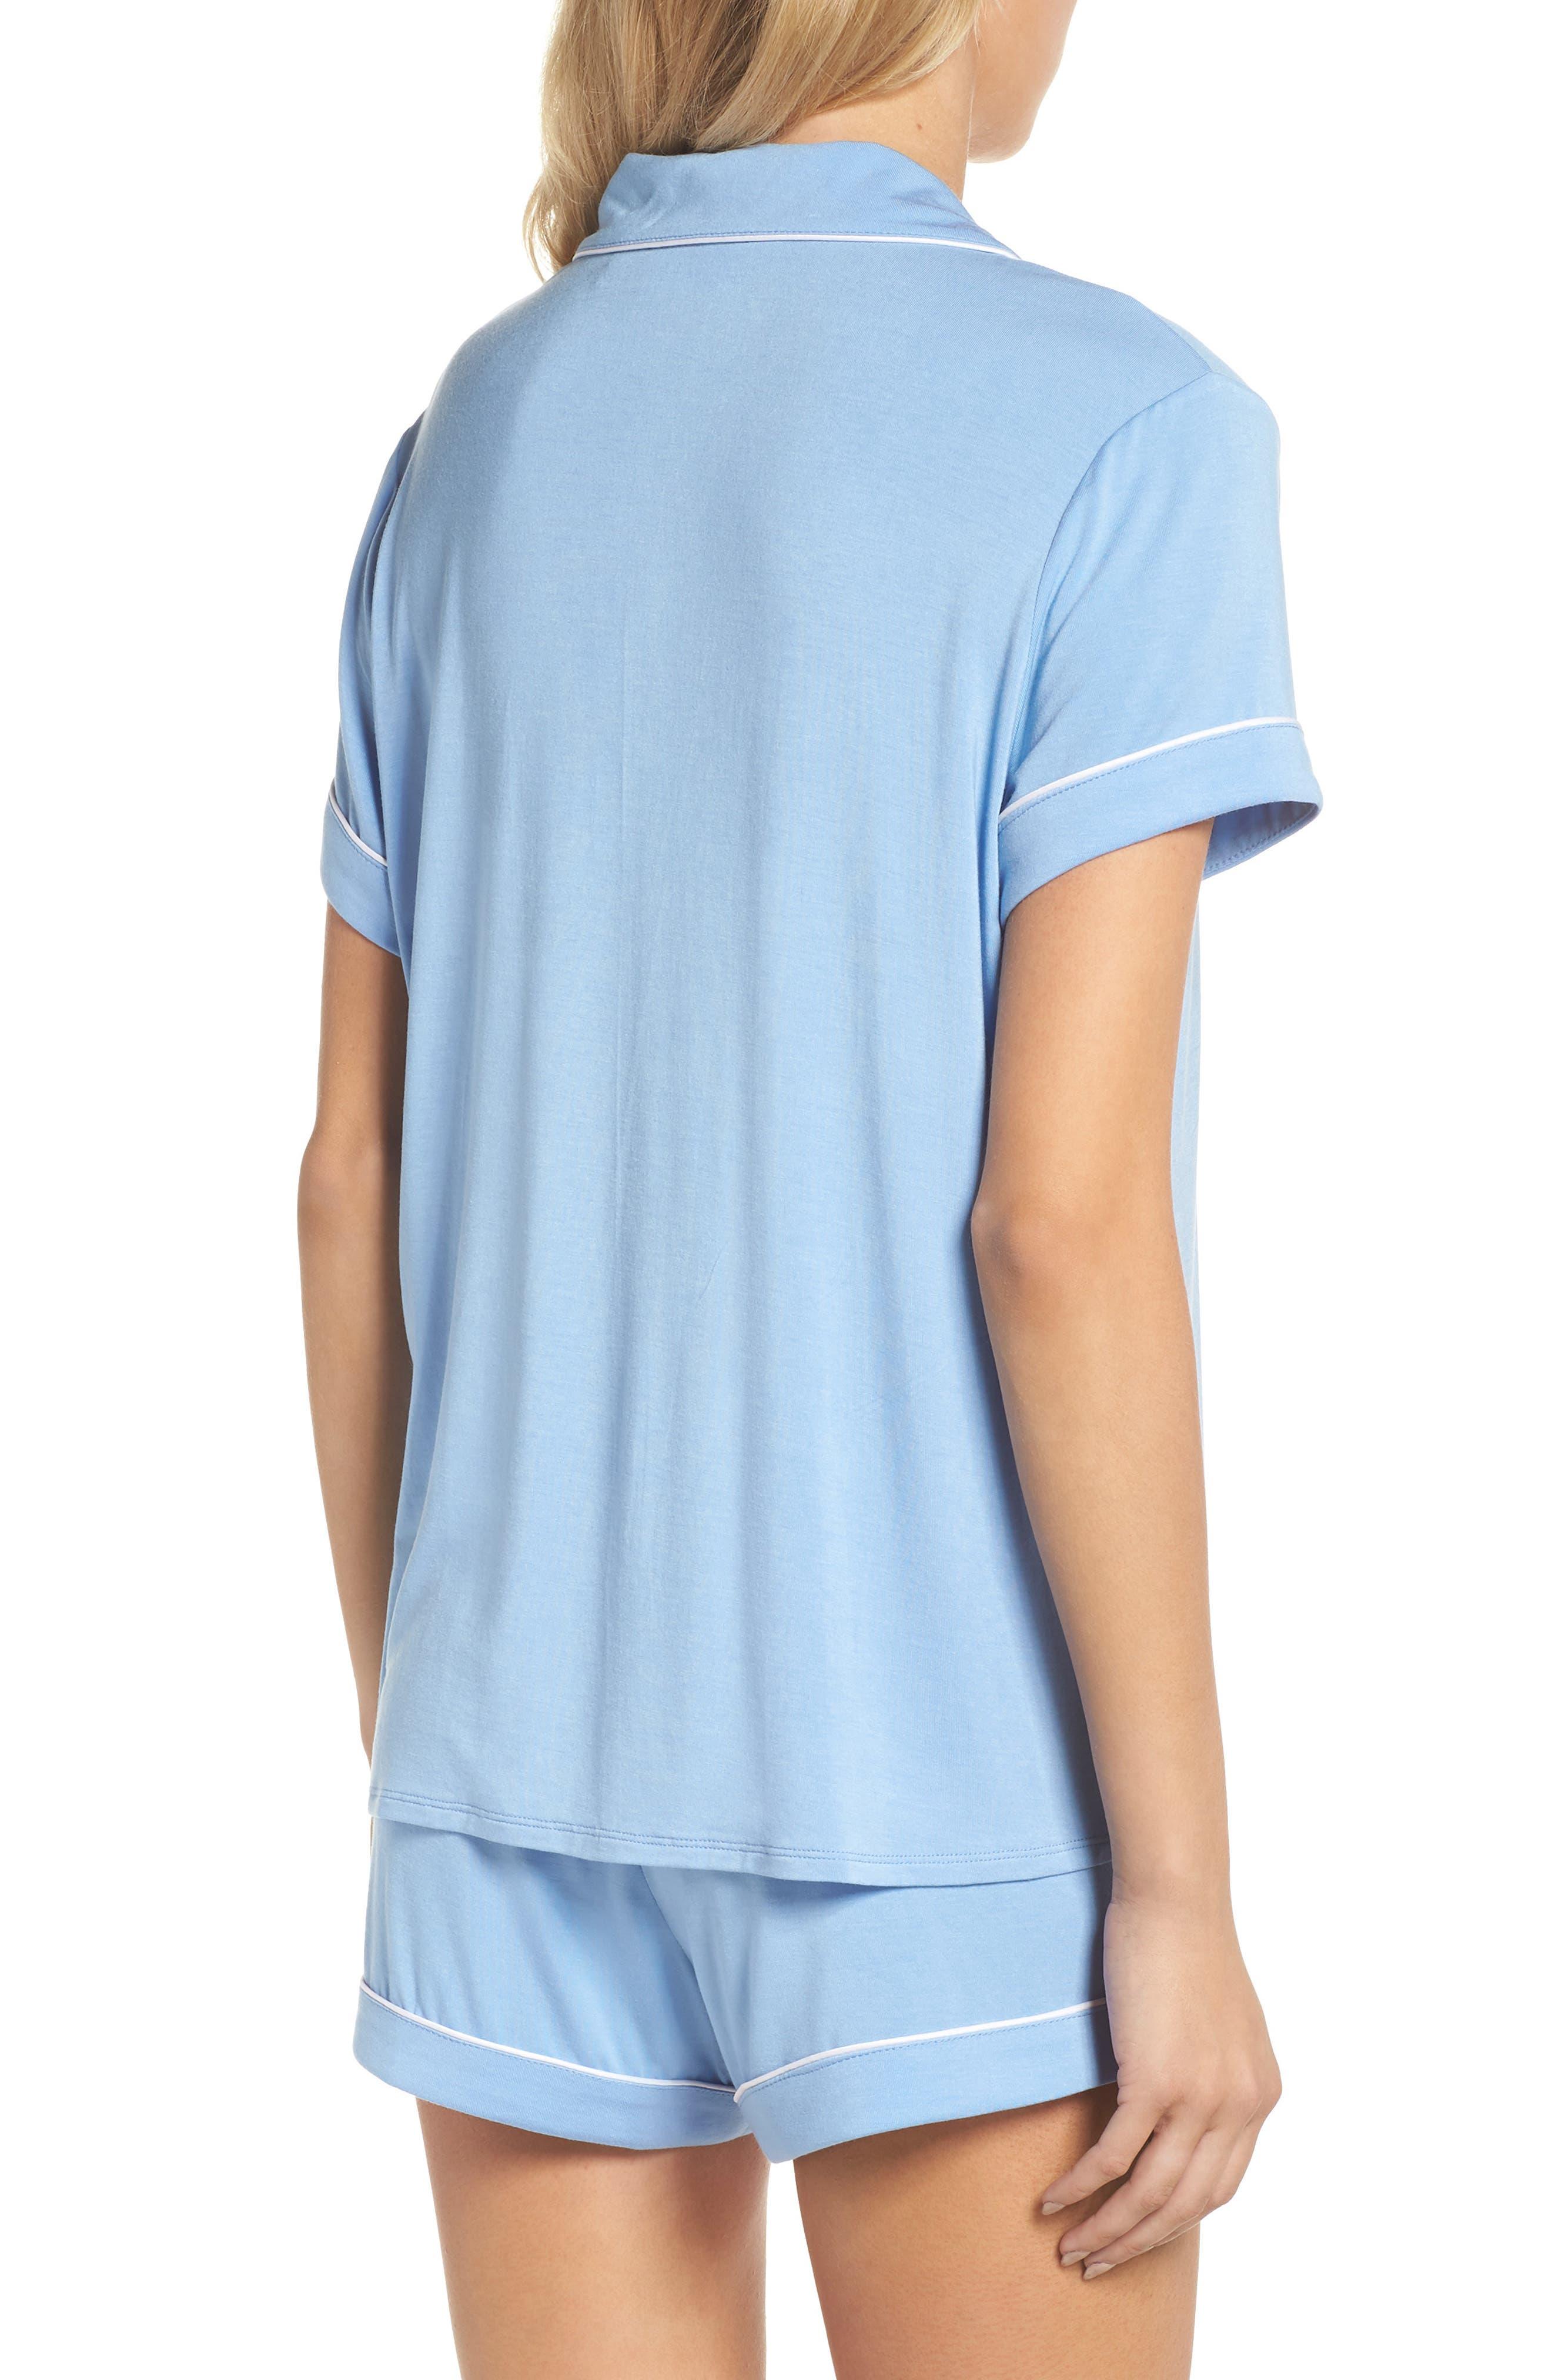 Moonlight Shortie Pajamas,                             Alternate thumbnail 2, color,                             421